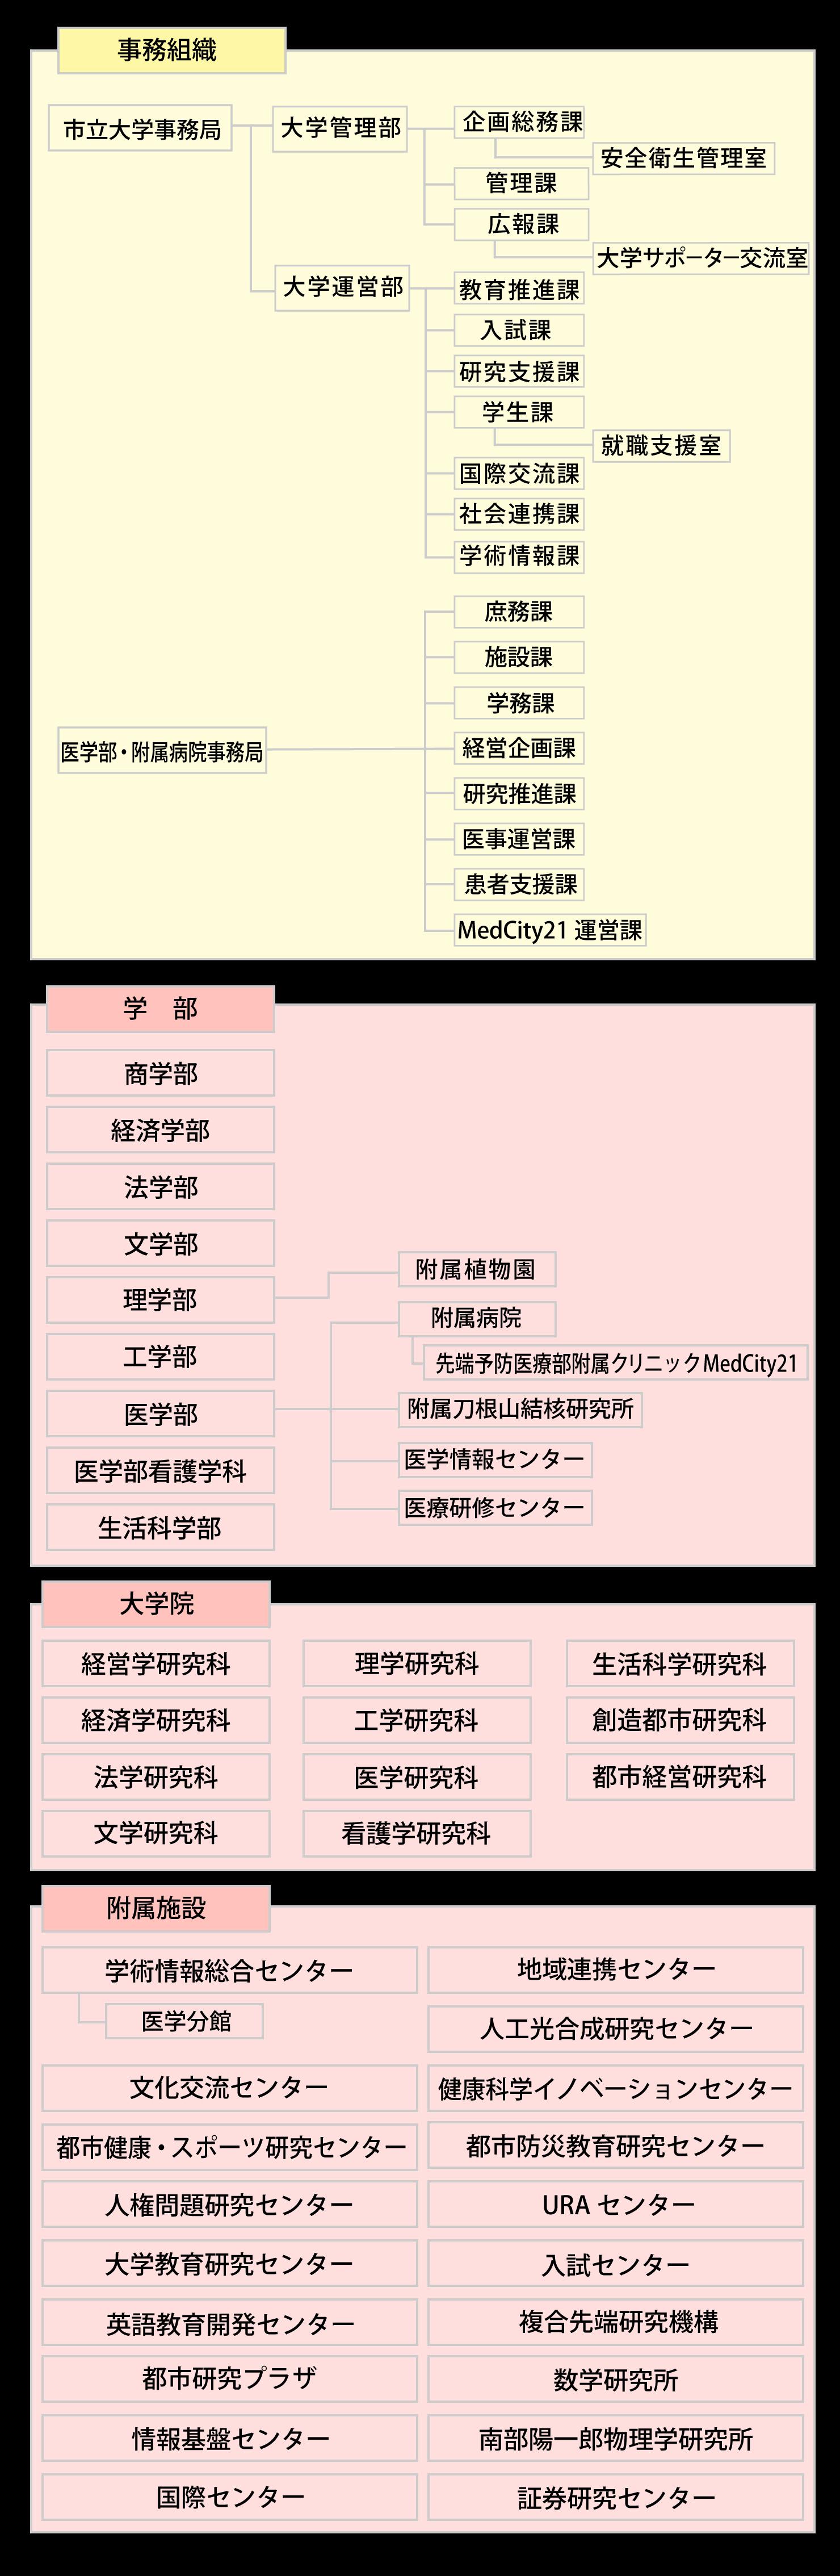 2019-4-1_組織図.png